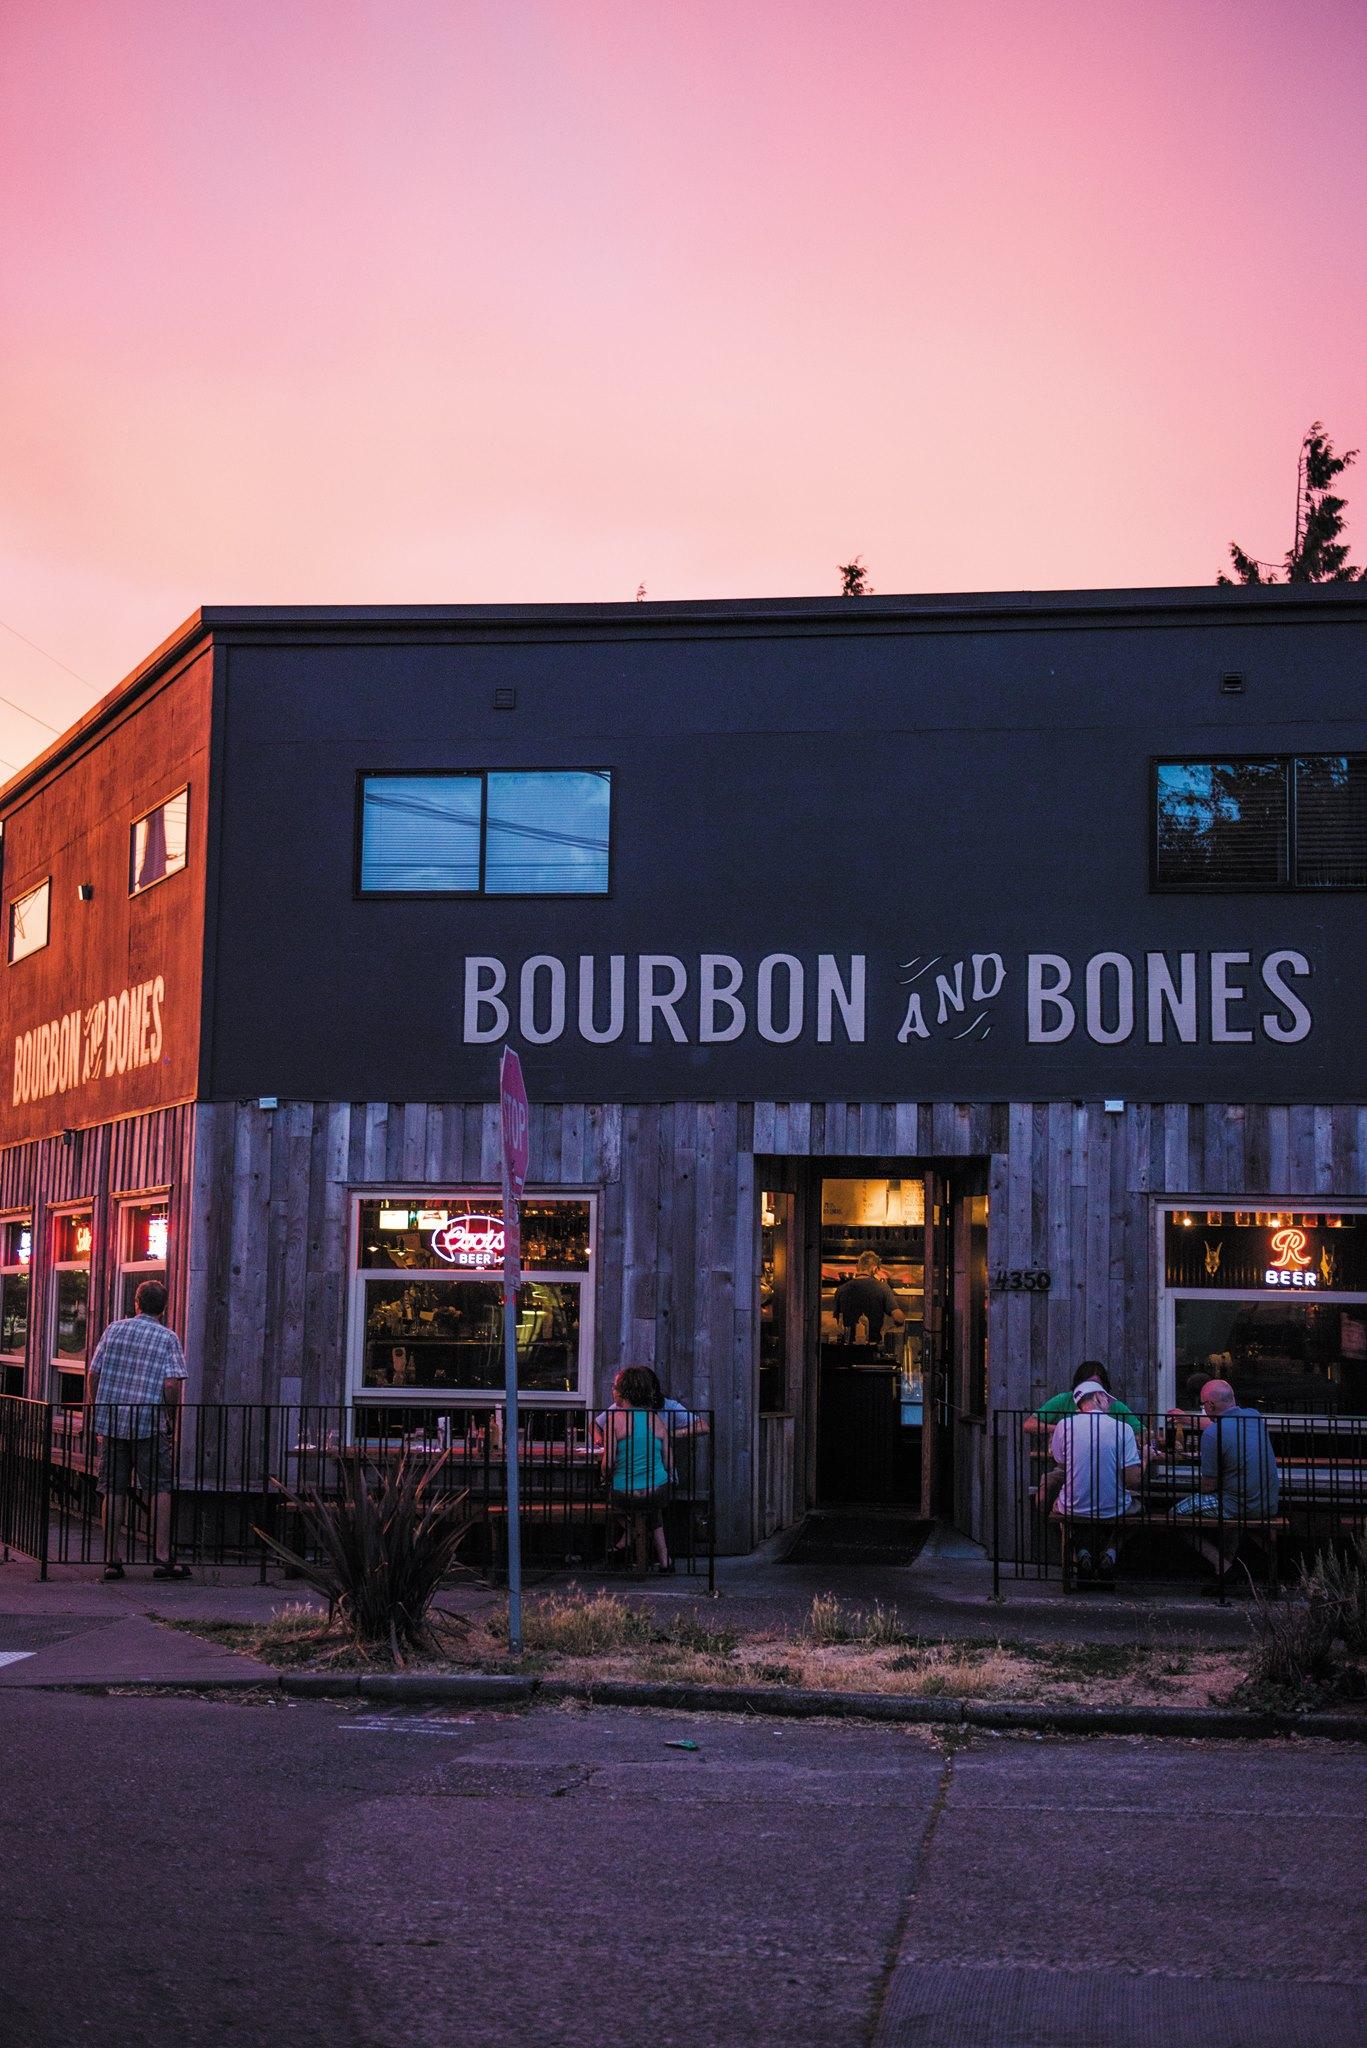 Bourbon and Bones